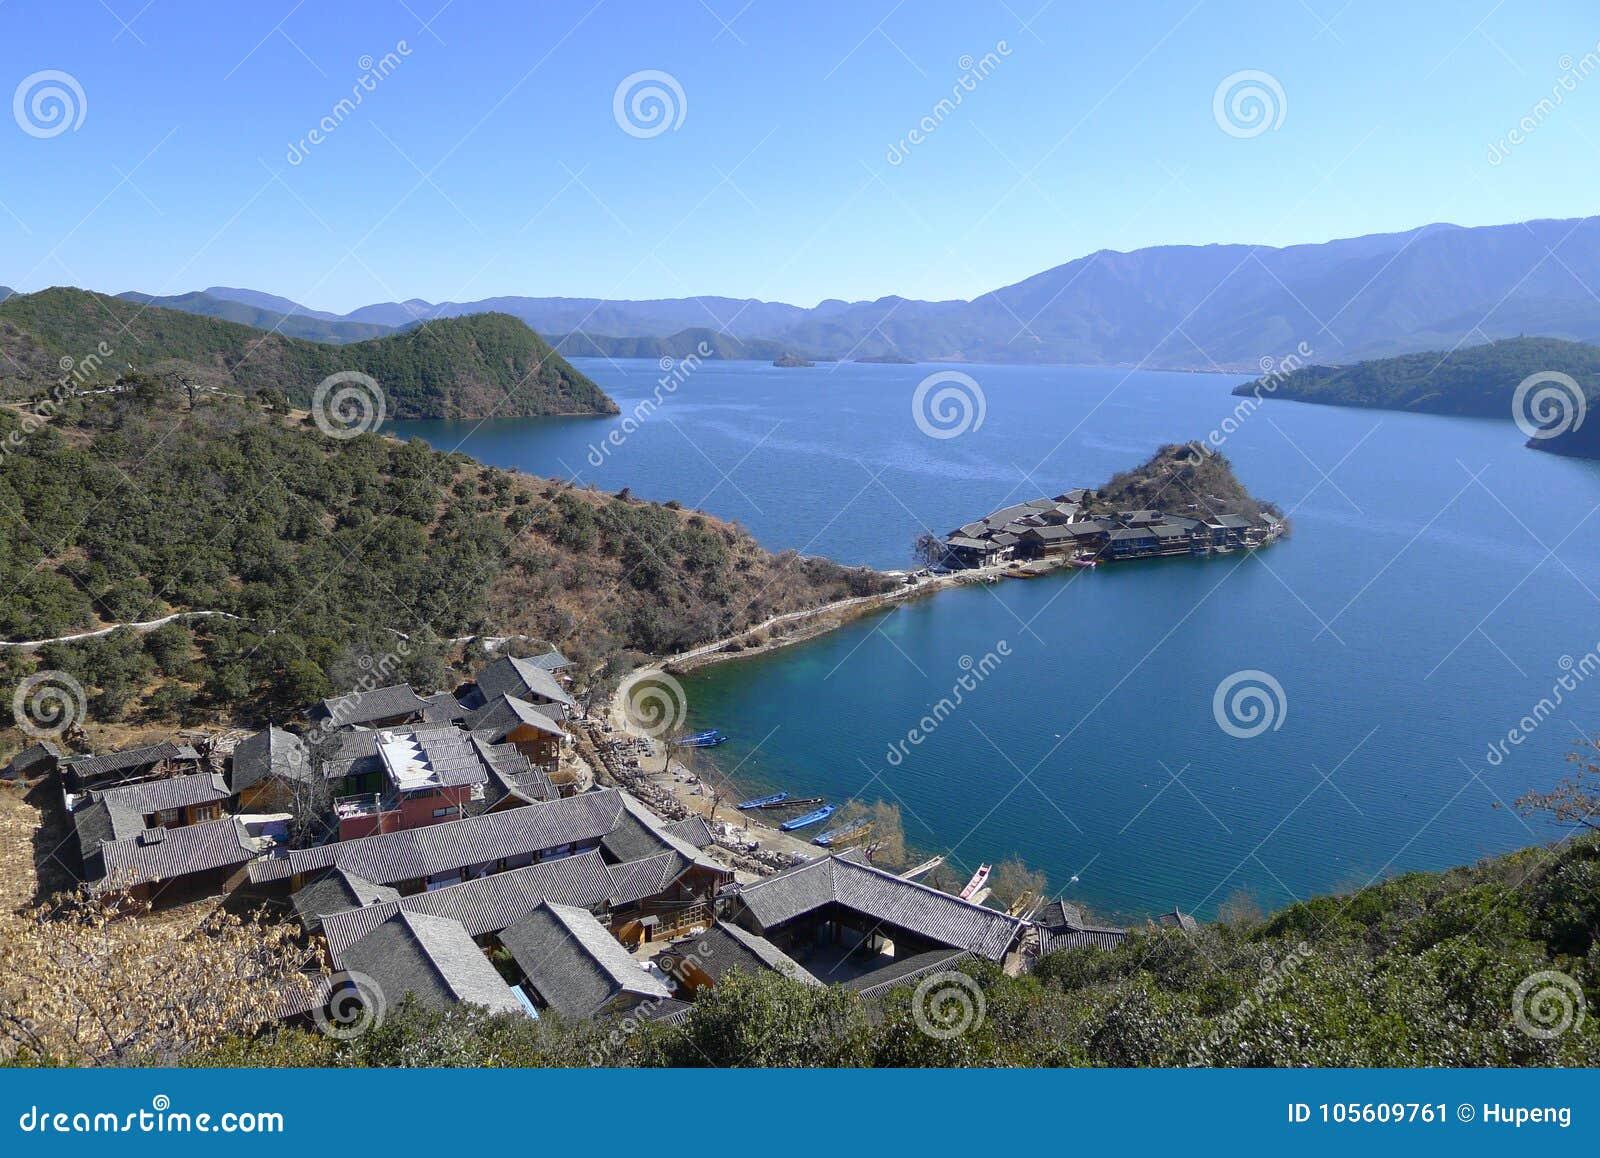 Lugu lake Li ge island stock image  Image of boat, house - 105609761